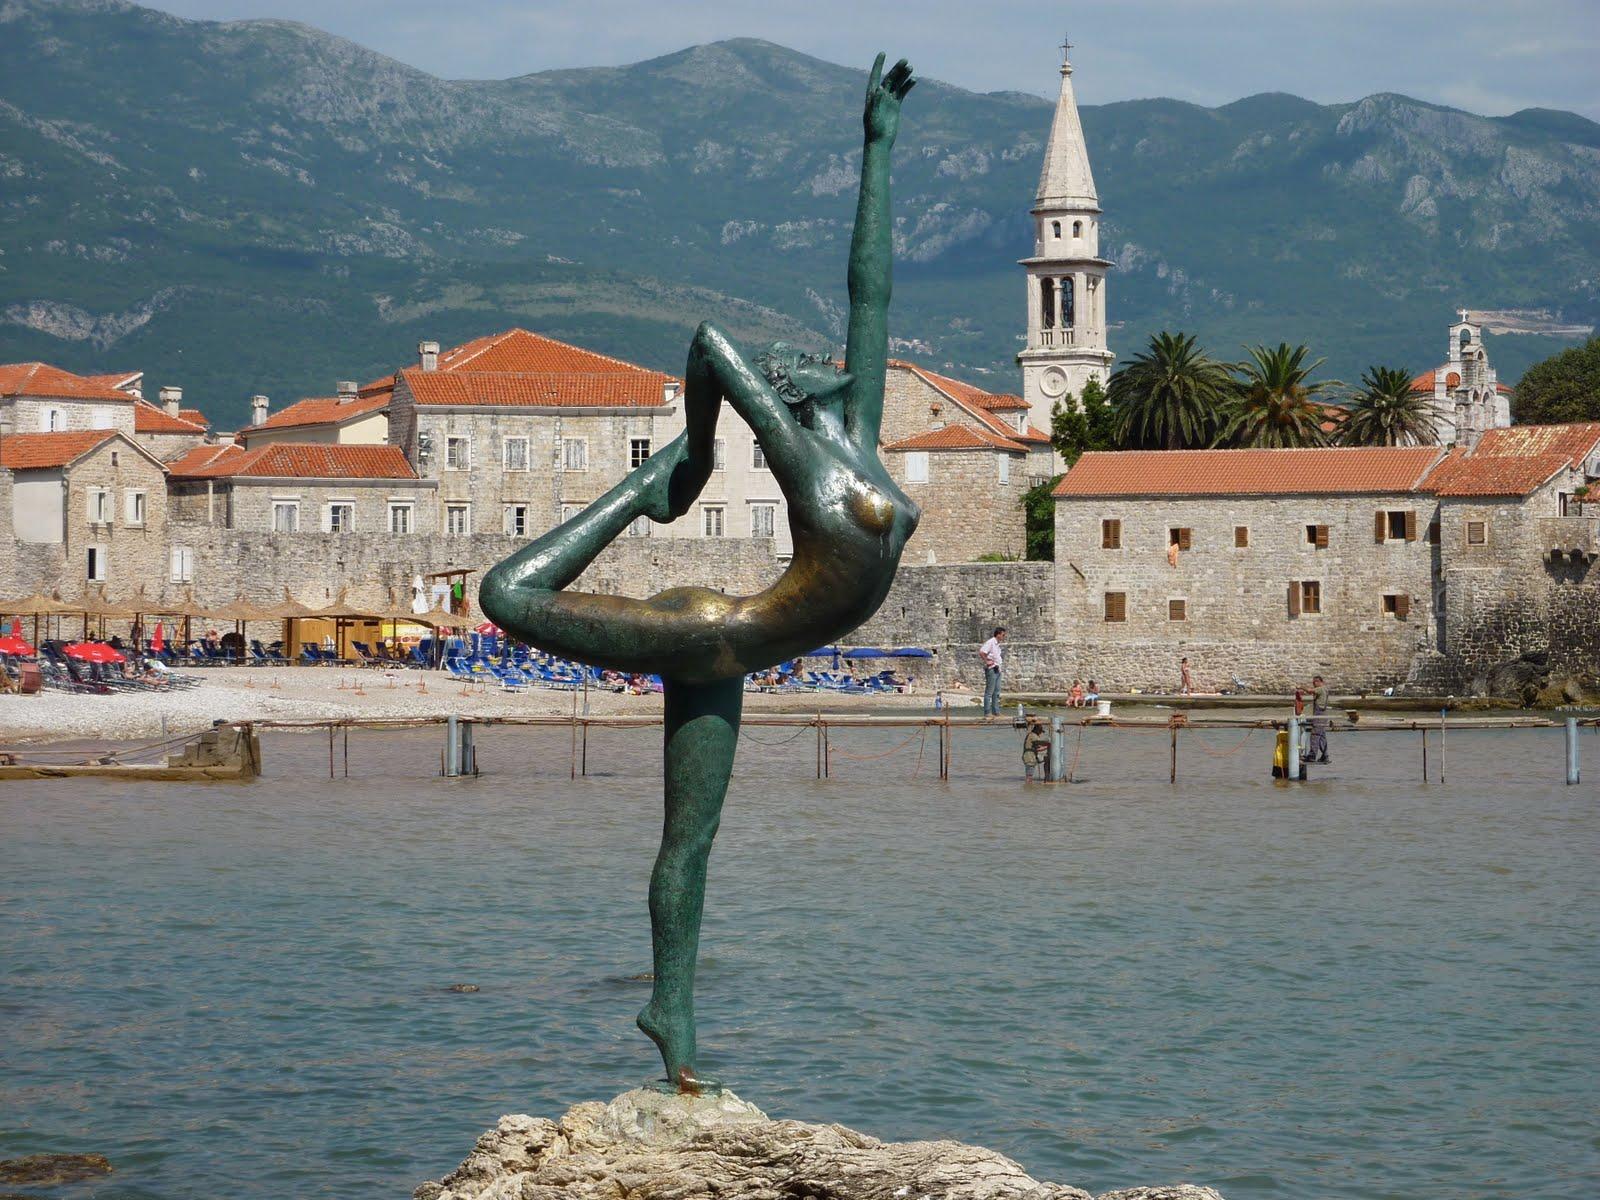 odihna montenegro, odihna muntenegru, budva hoteluri